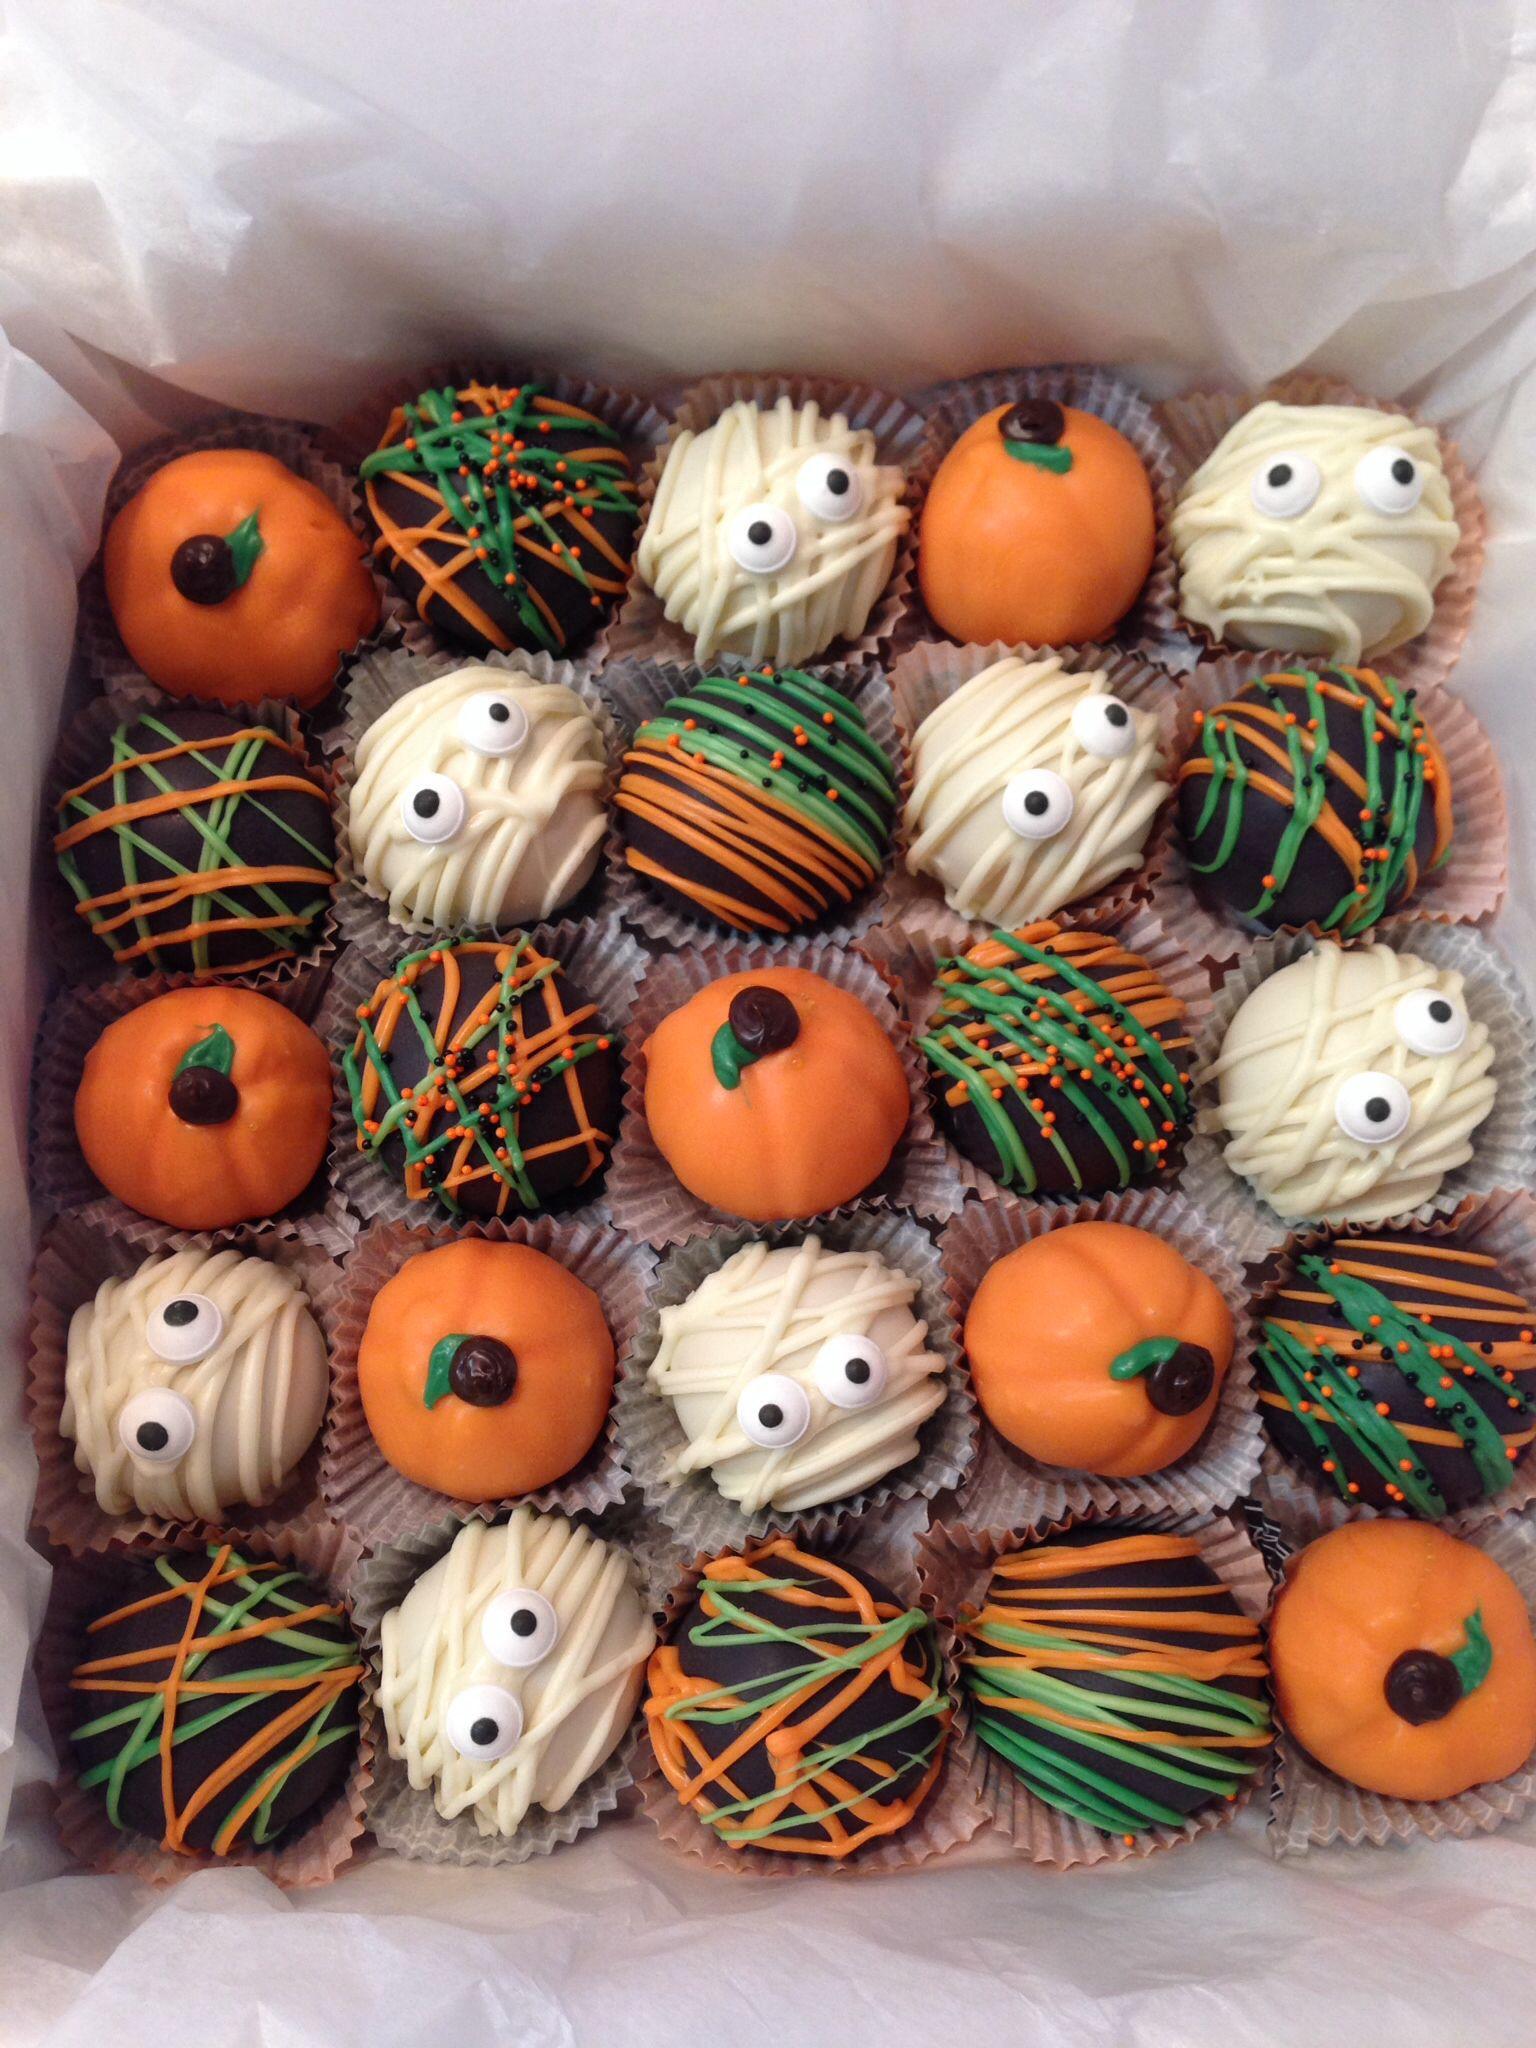 Halloween cake balls | Recipes | Pinterest